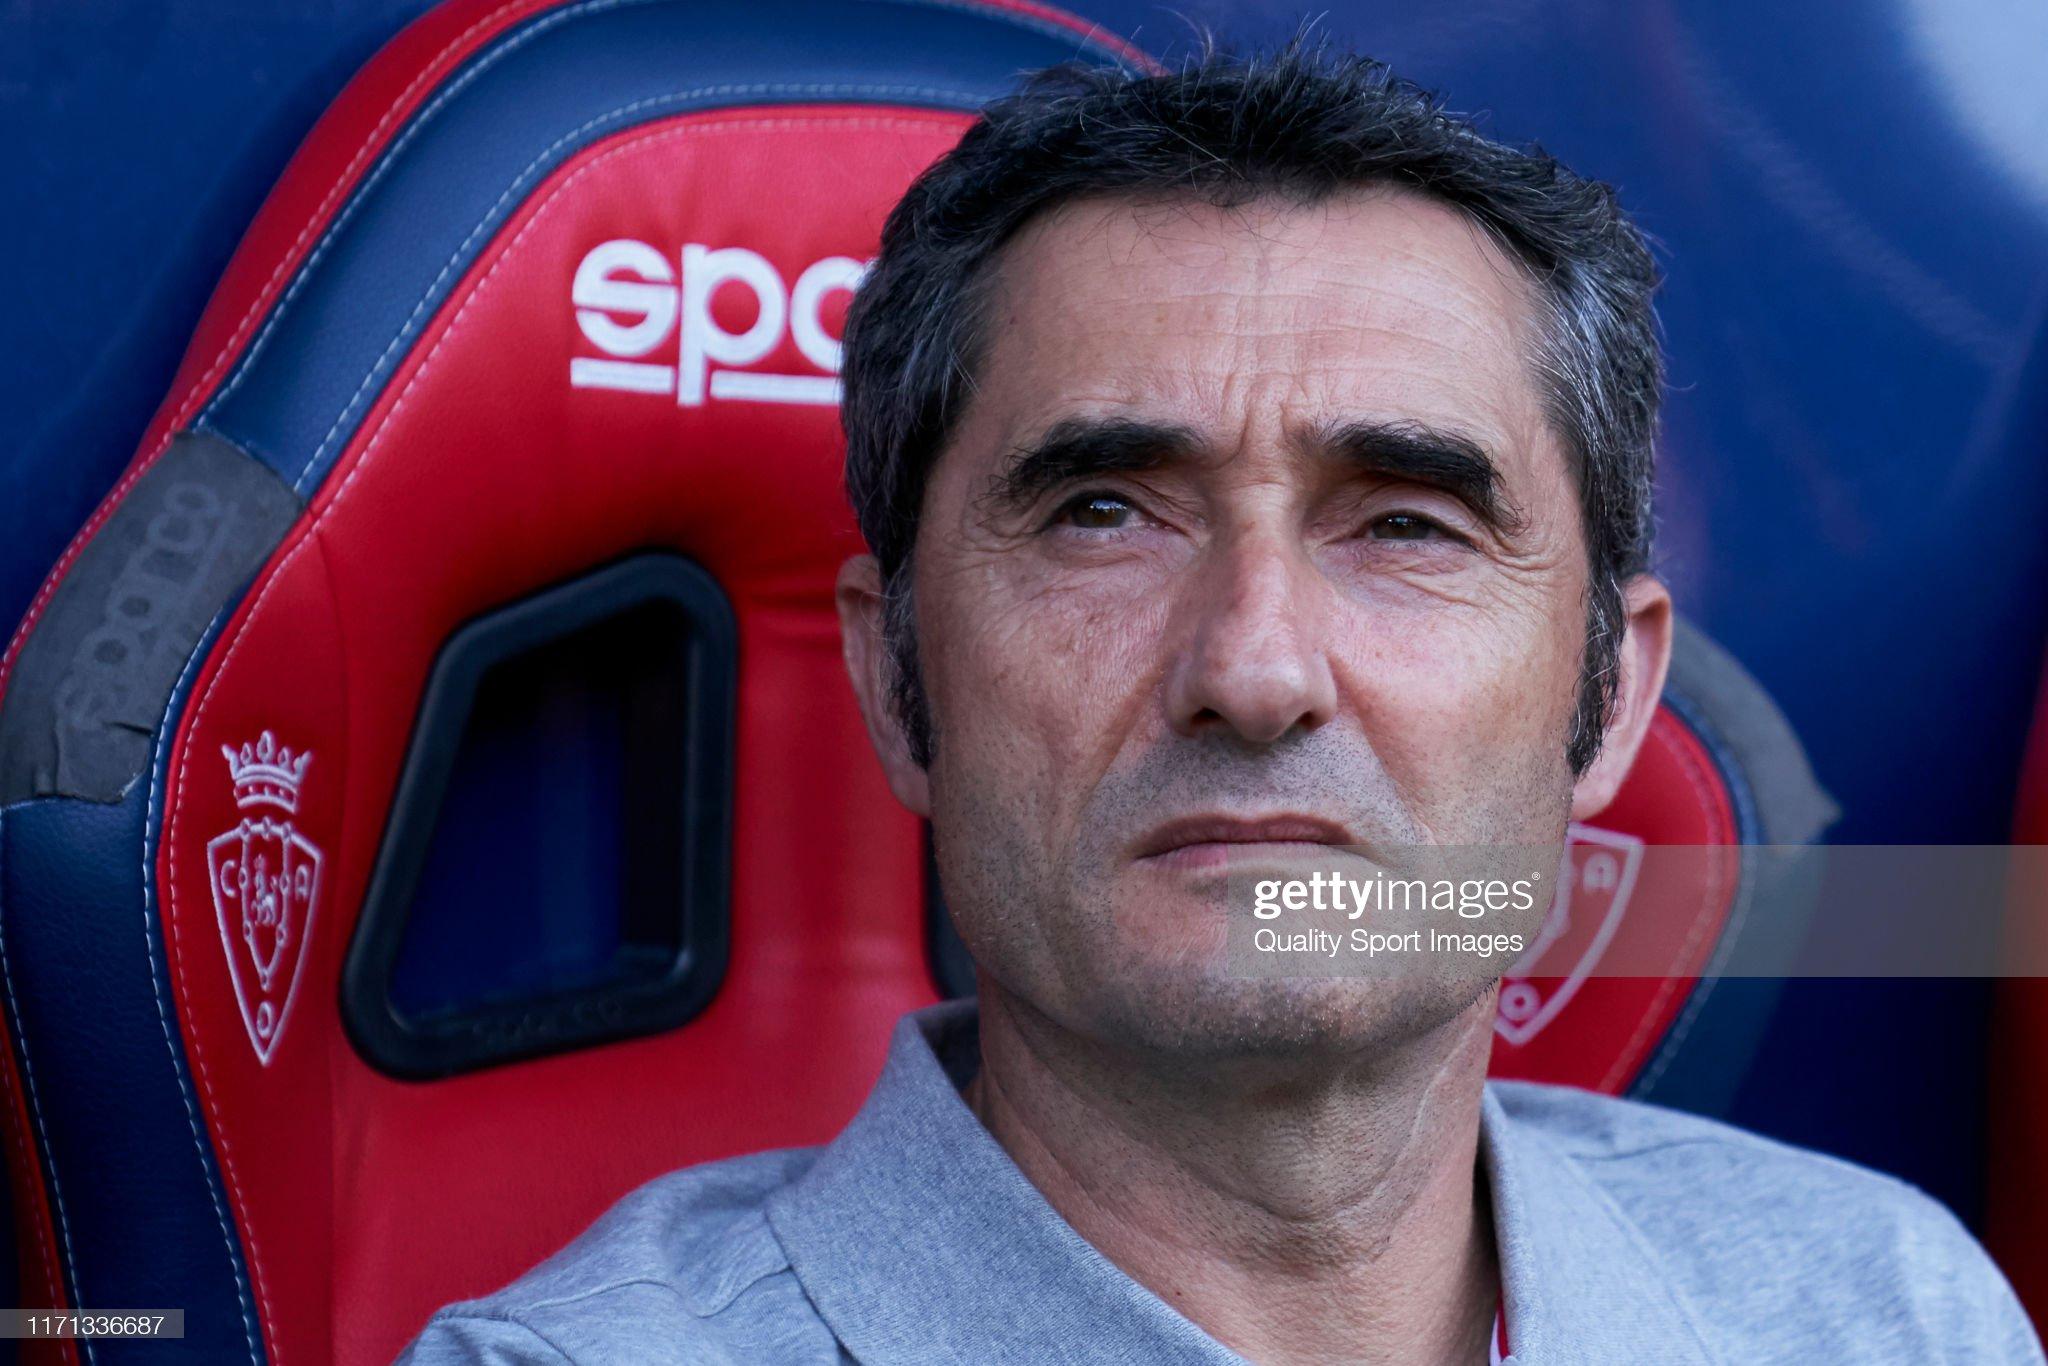 صور مباراة : أوساسونا - برشلونة 2-2 ( 31-08-2019 )  Ernesto-valverde-manager-of-barcelona-looks-on-prior-to-the-liga-ca-picture-id1171336687?s=2048x2048